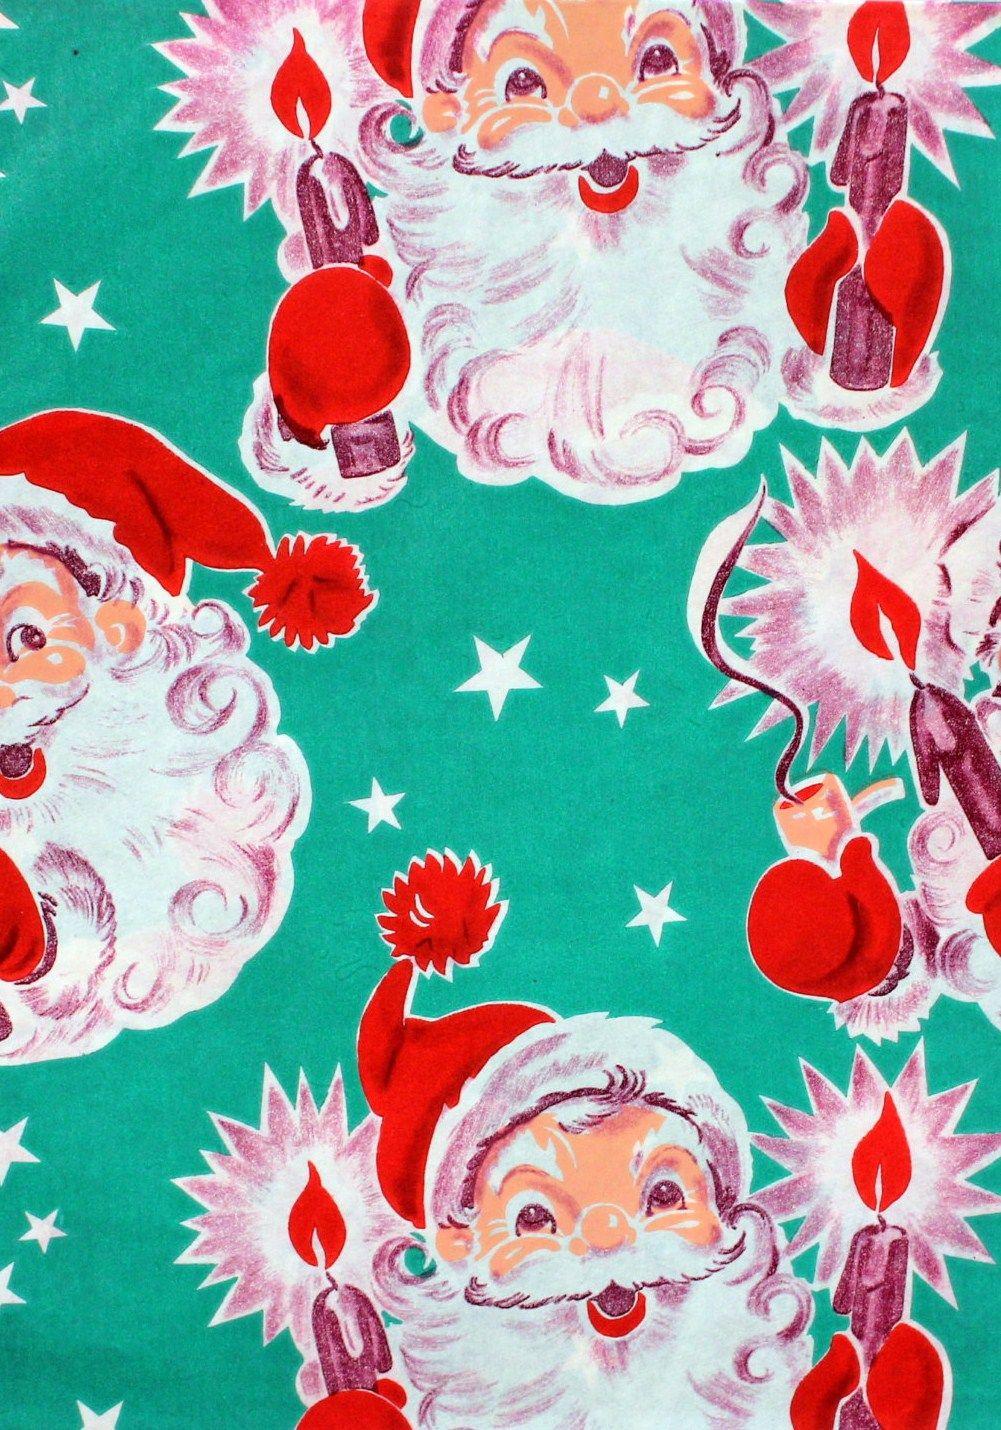 Vintage Santa Wrapping Paper The Aqua Red Is Spectacular Christmas Ephemera Vintage Christmas Wrapping Paper Vintage Christmas Gifts